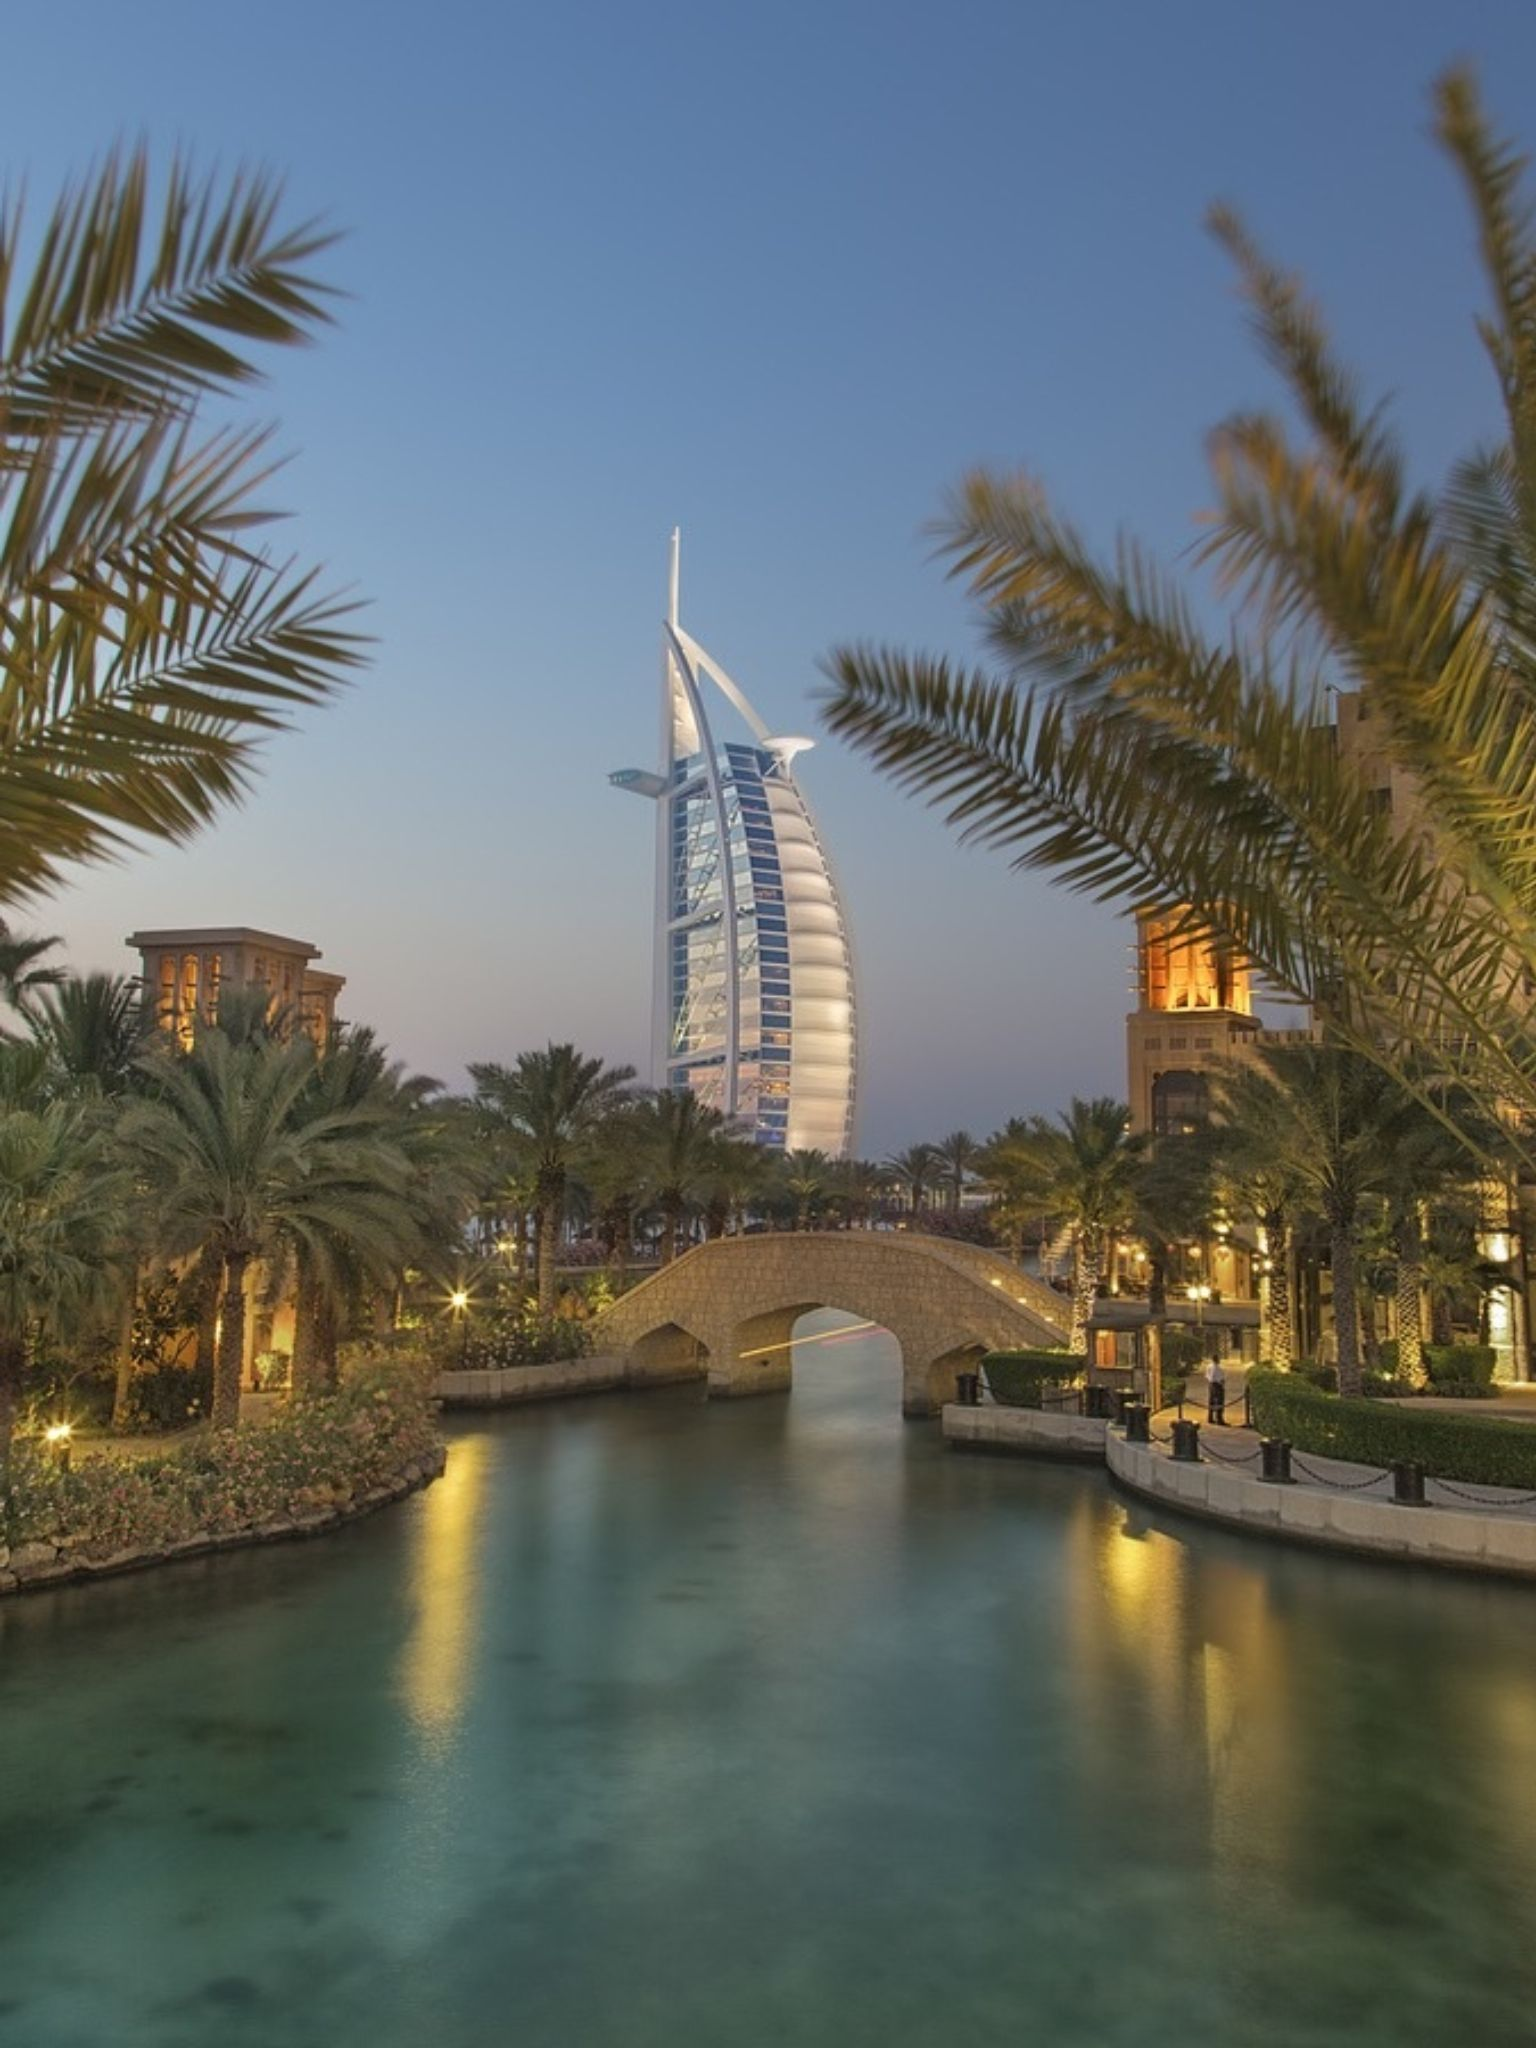 burj khalifa worlds tallest tower, United Arab Emirates